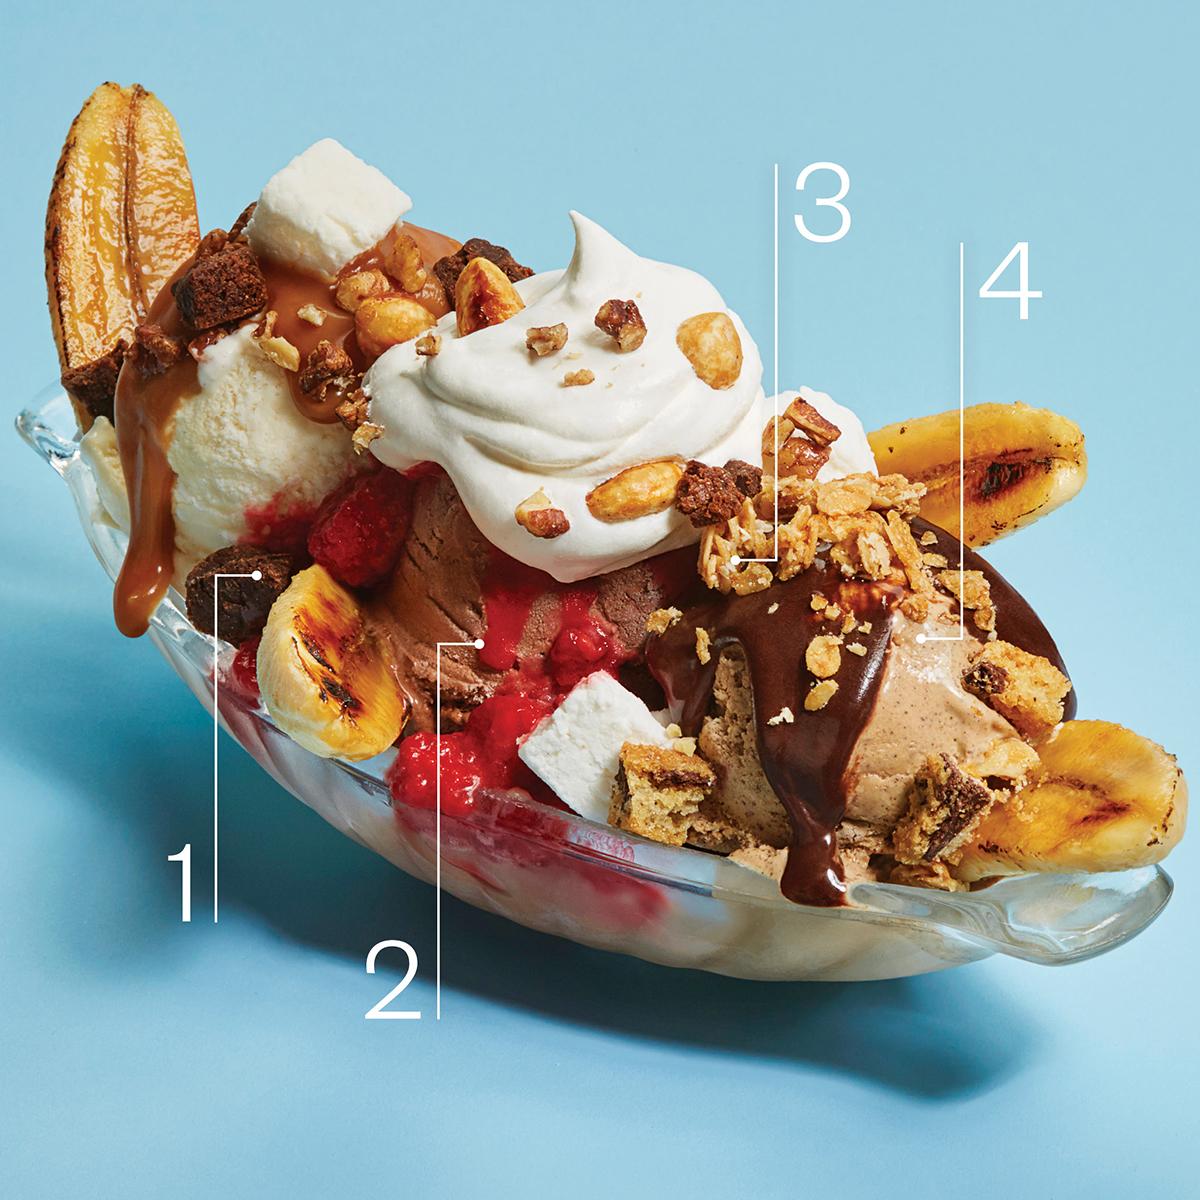 banana-split-forge-ice-cream-bar.jpg